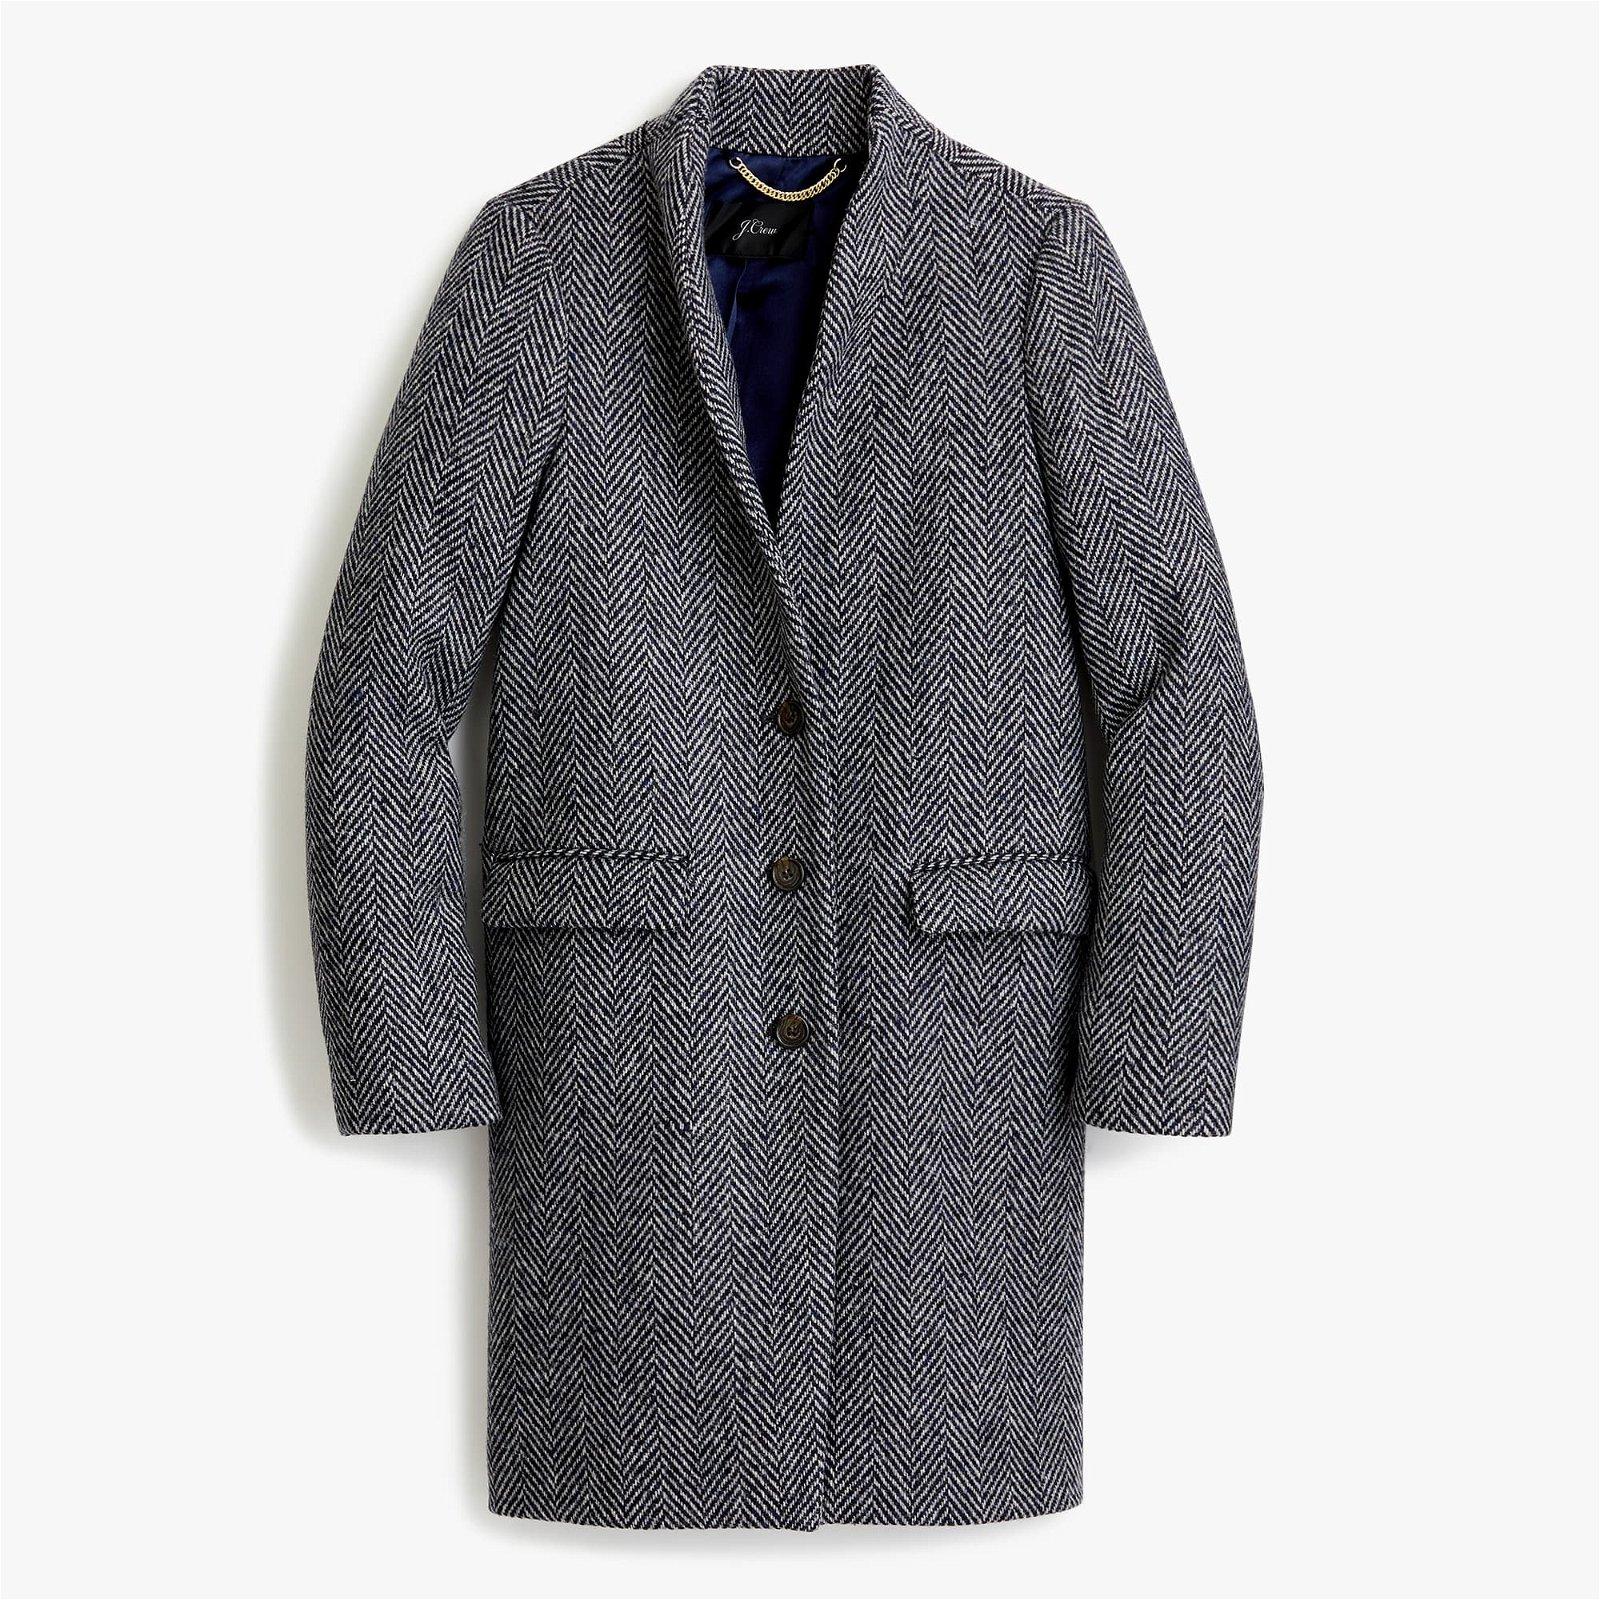 Classic Oversized topcoat in English herringbone wool